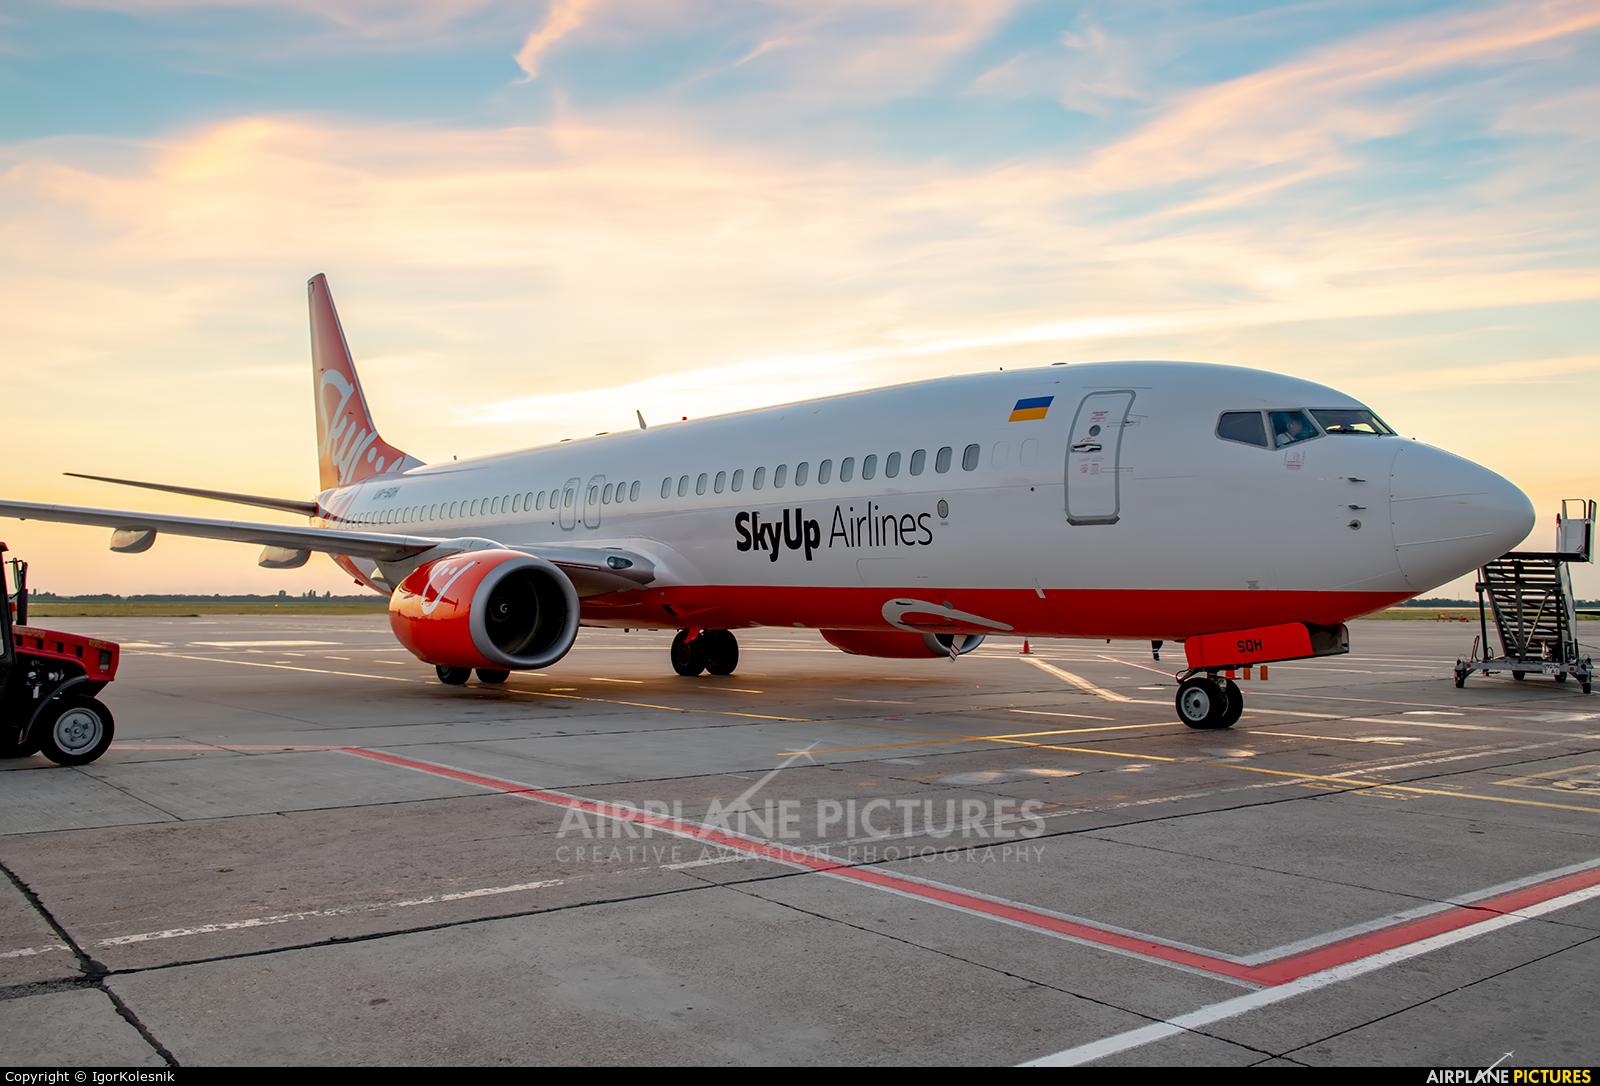 SkyUp Airlines UR-SQH aircraft at Kyiv - Borispol